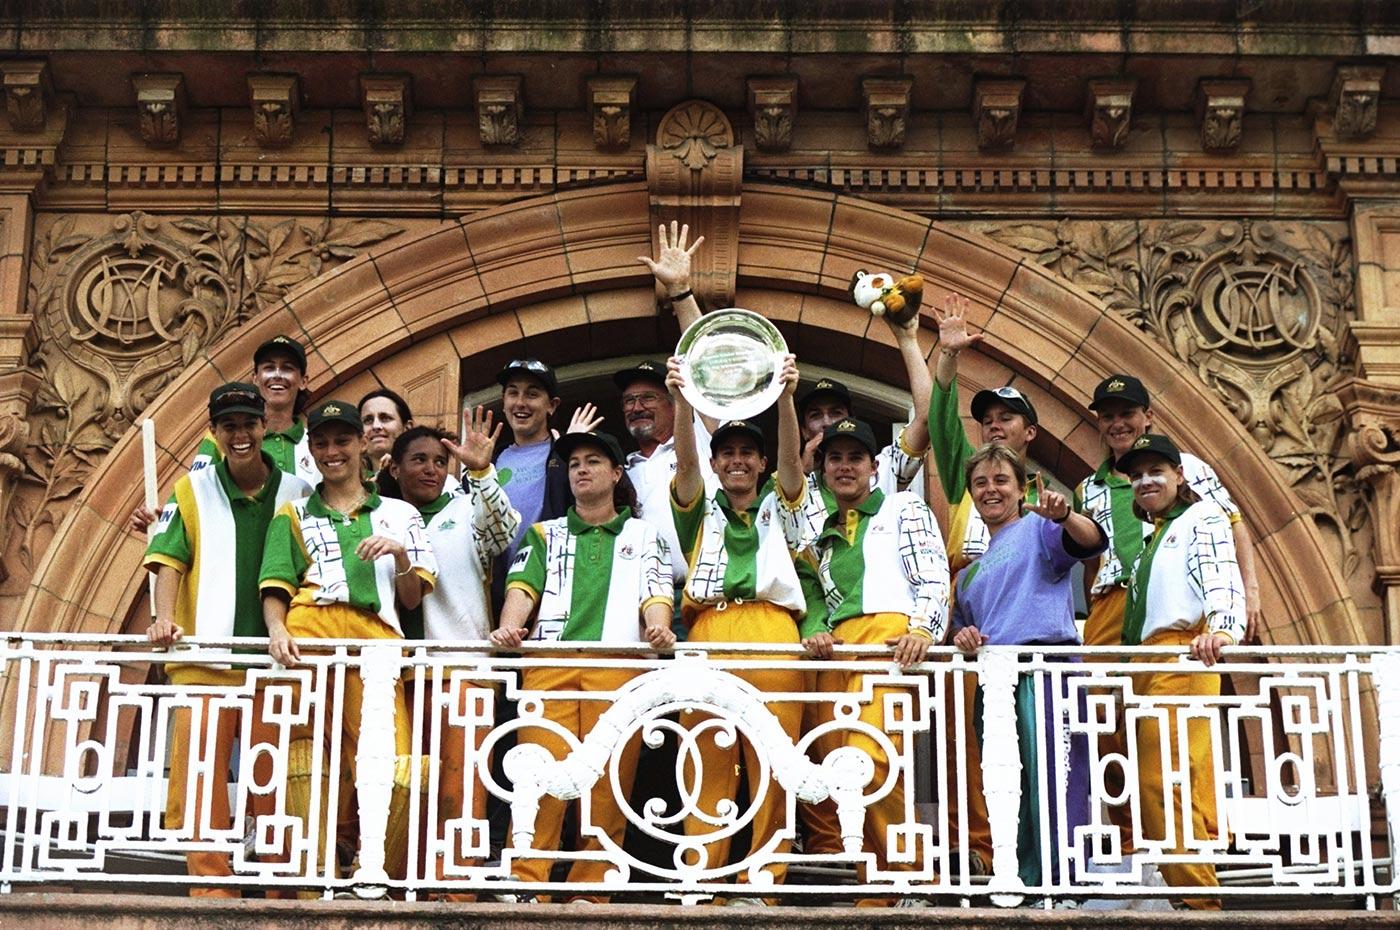 Australia take the ODI series 5-0 at Lord's